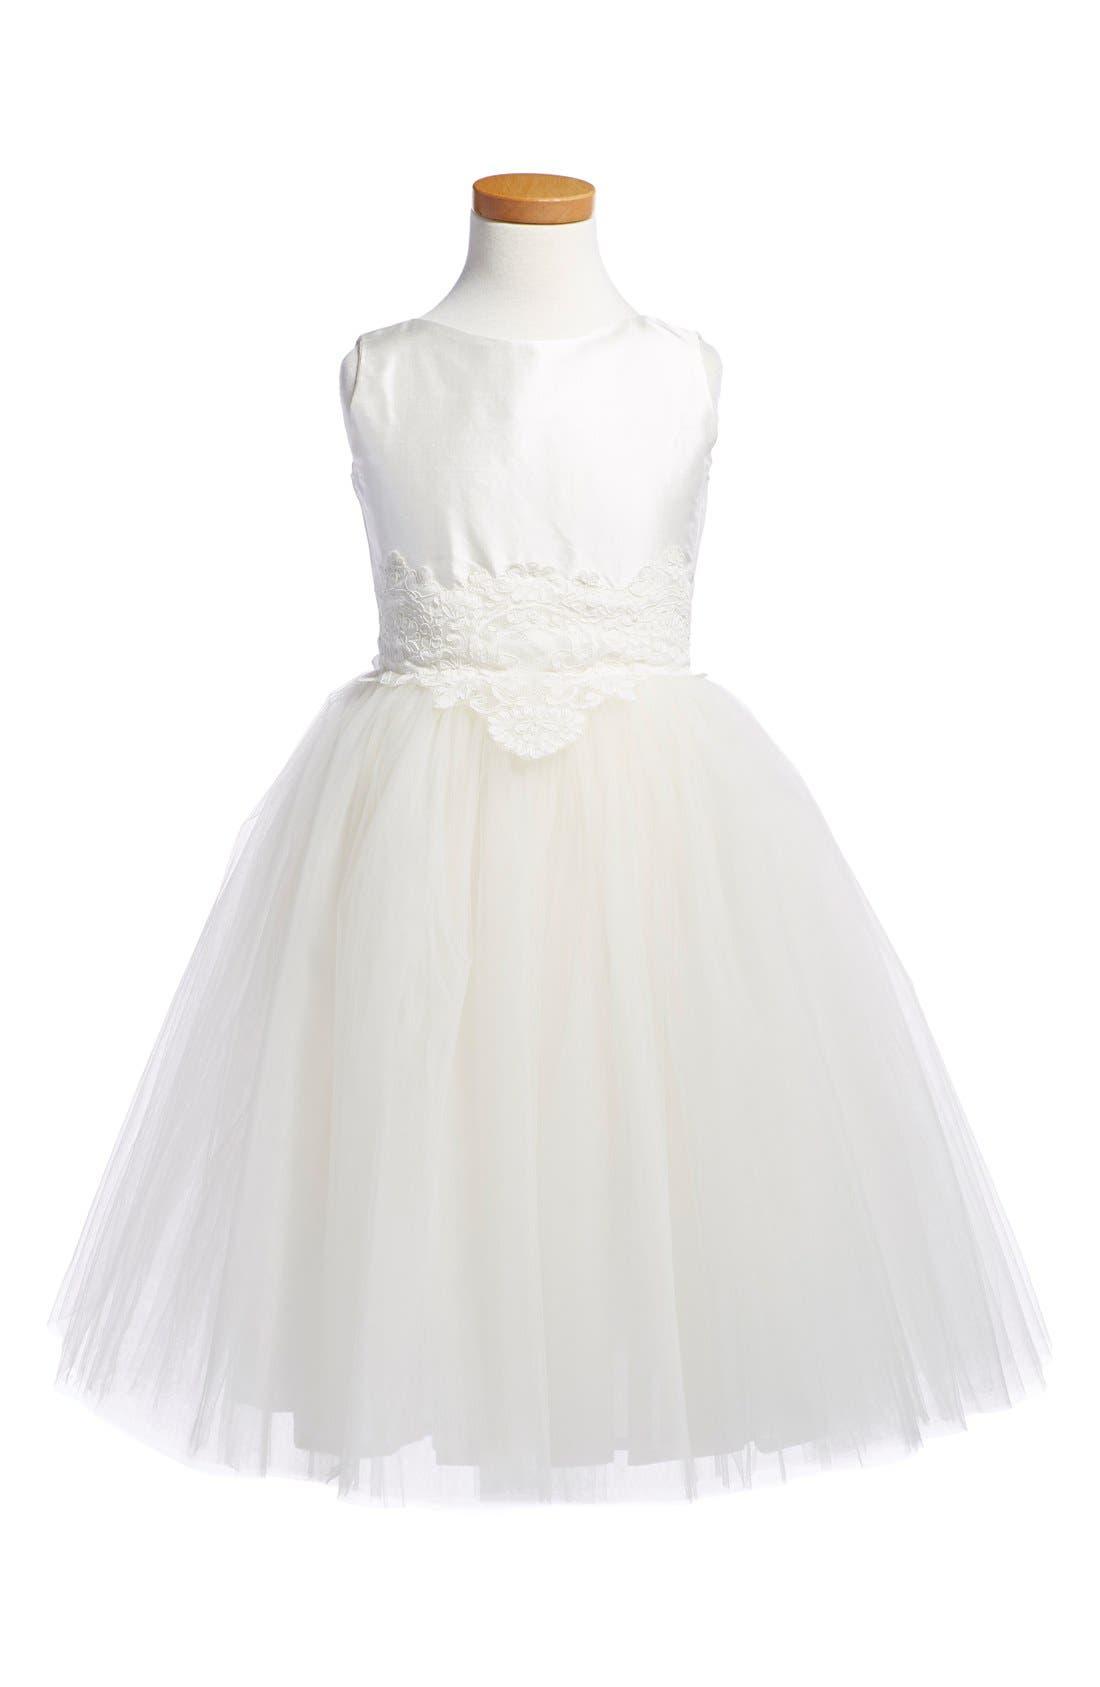 'Enchanting' Sleeveless Taffeta Dress,                             Main thumbnail 1, color,                             Ivory